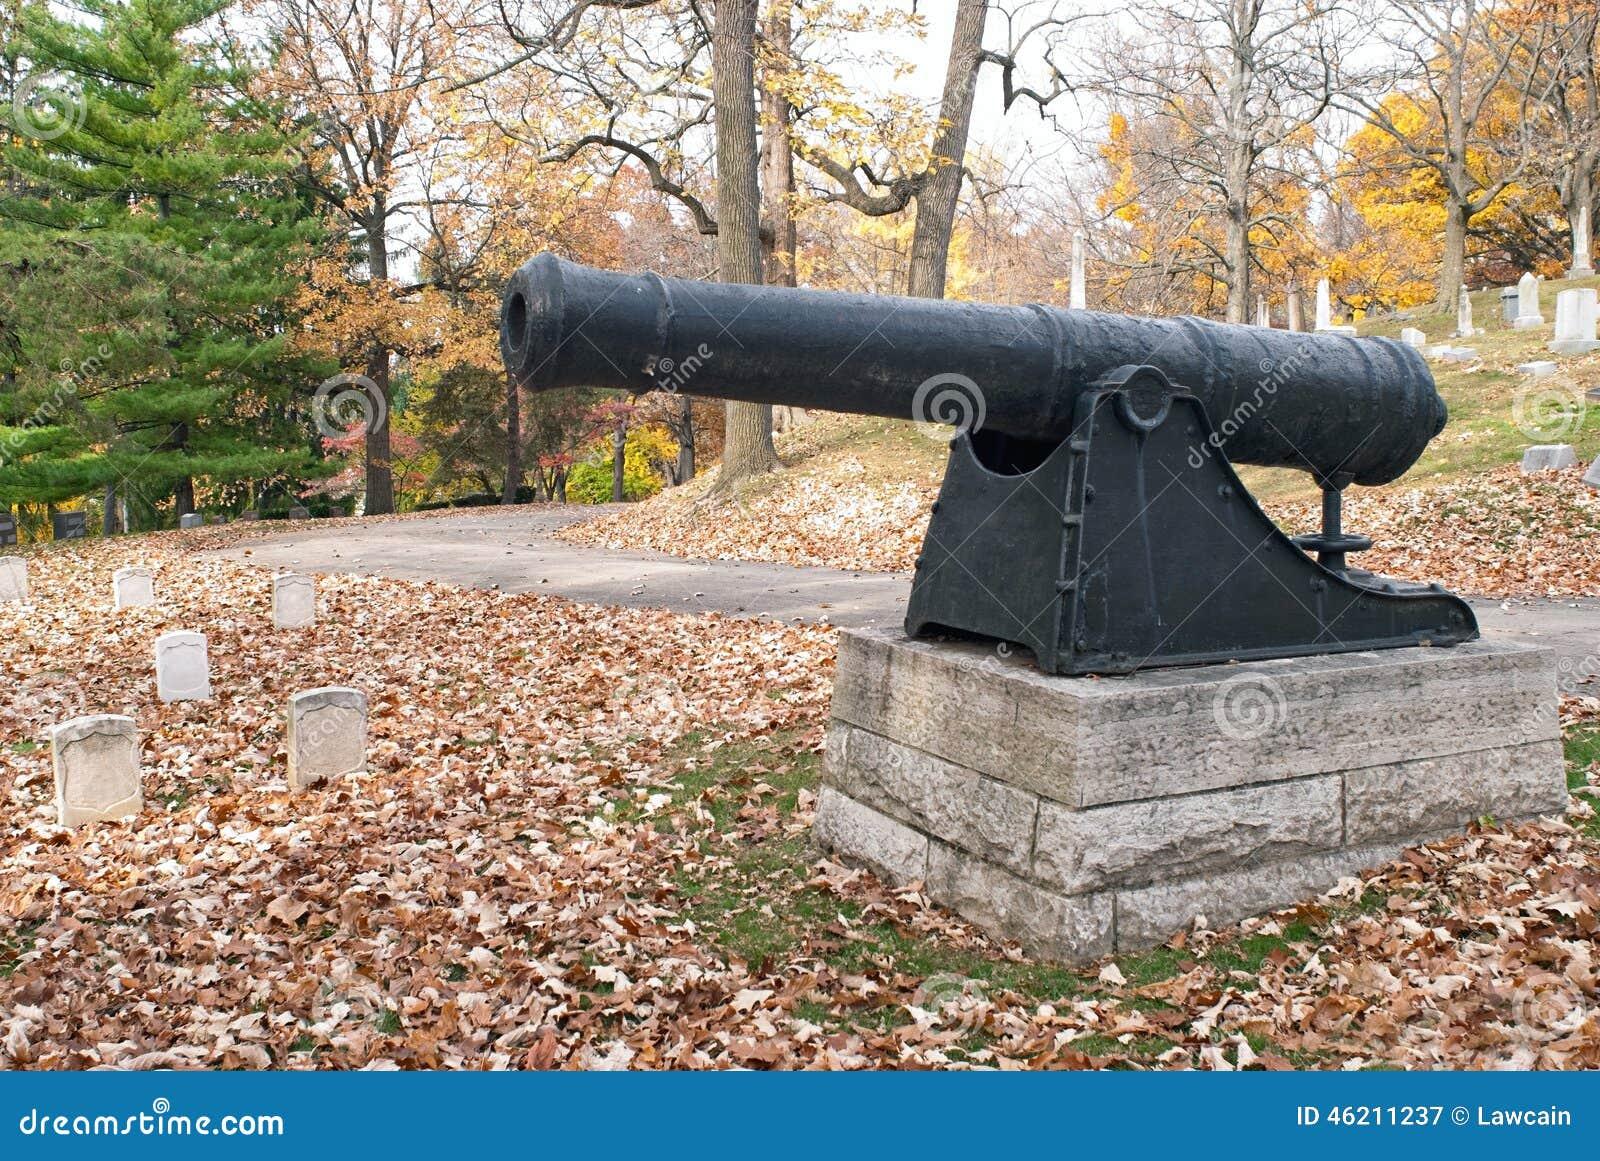 Revolutionary War Cannon in Cemetery